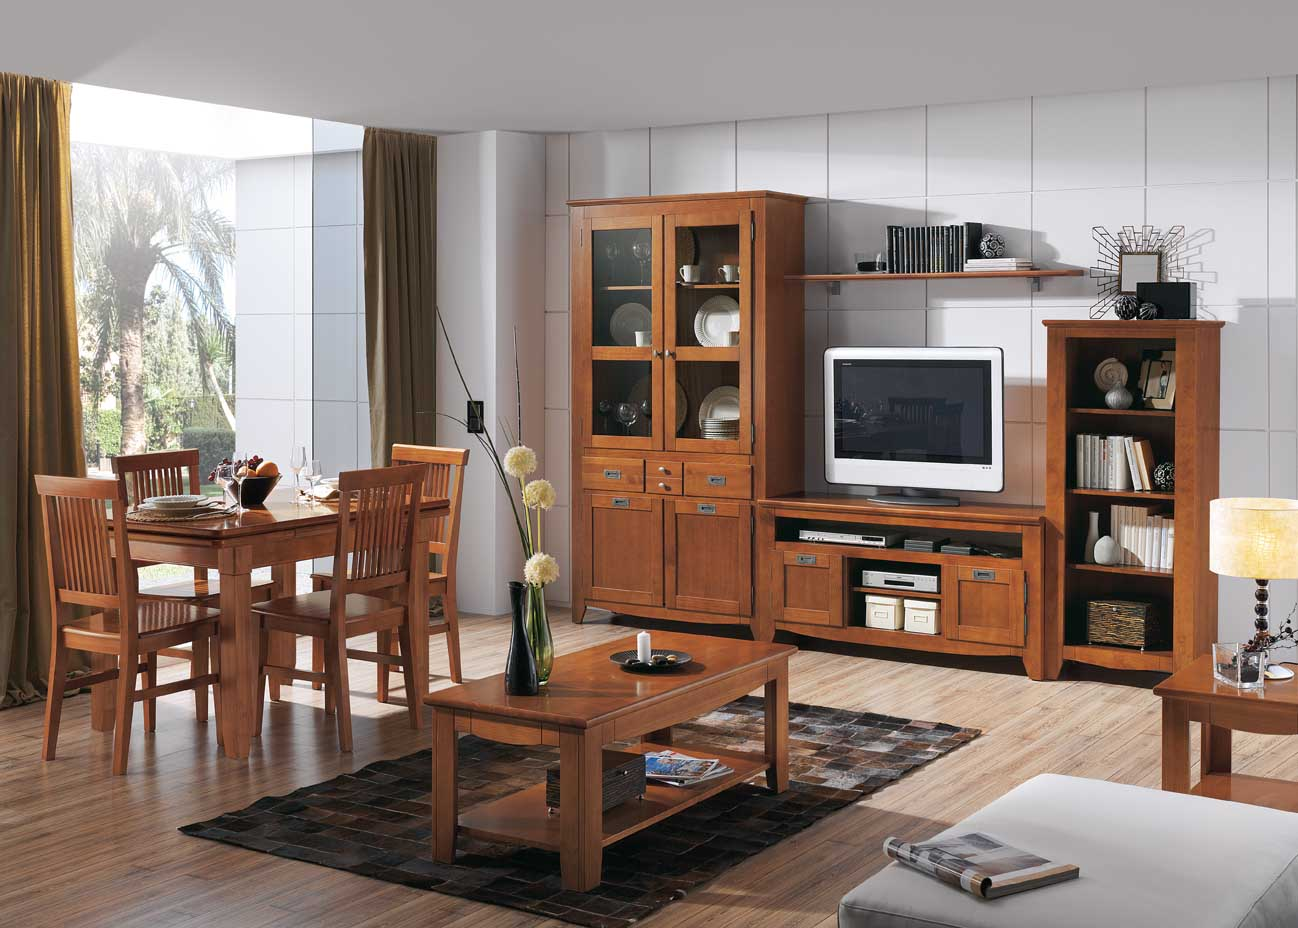 Uni n fabricantes de tresillos librer as de pino en uni n - Muebles de valencia fabricantes ...